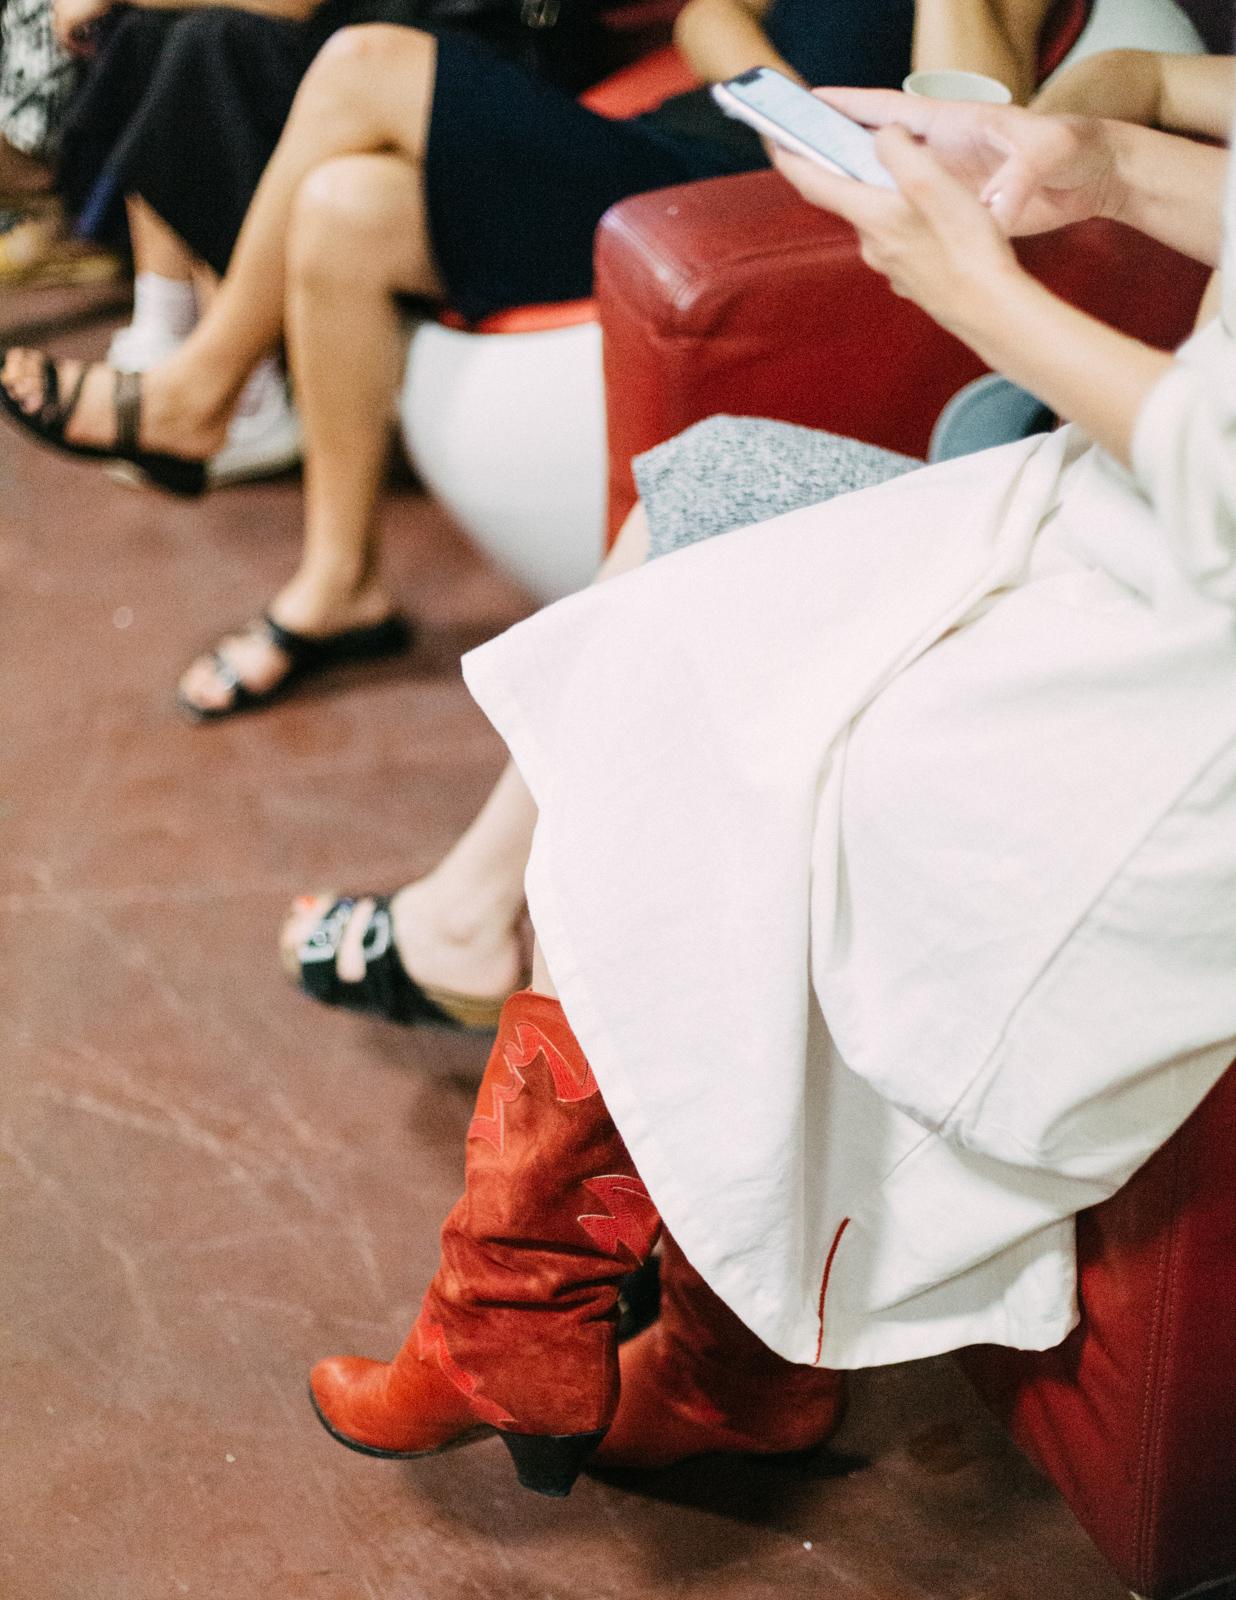 fashion-revolution-assembly-(c)-sustainable-fashion-matterz-44.jpg